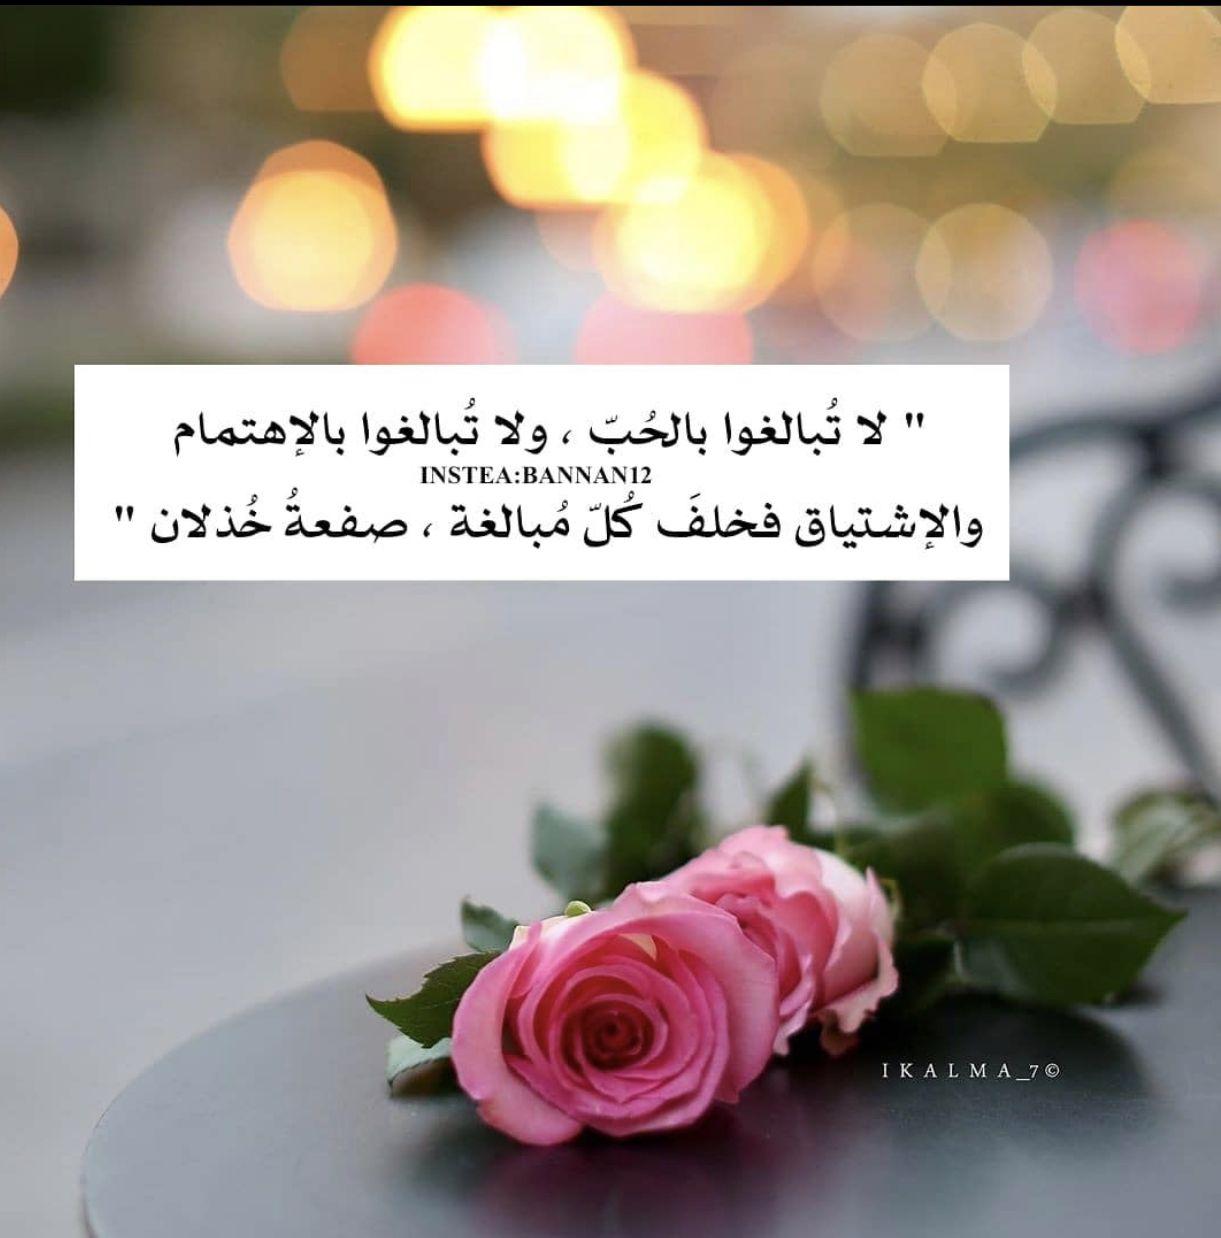 Pin By عابرة سبيل On اعجبني Romantic Love Quotes Romantic Love Romantic